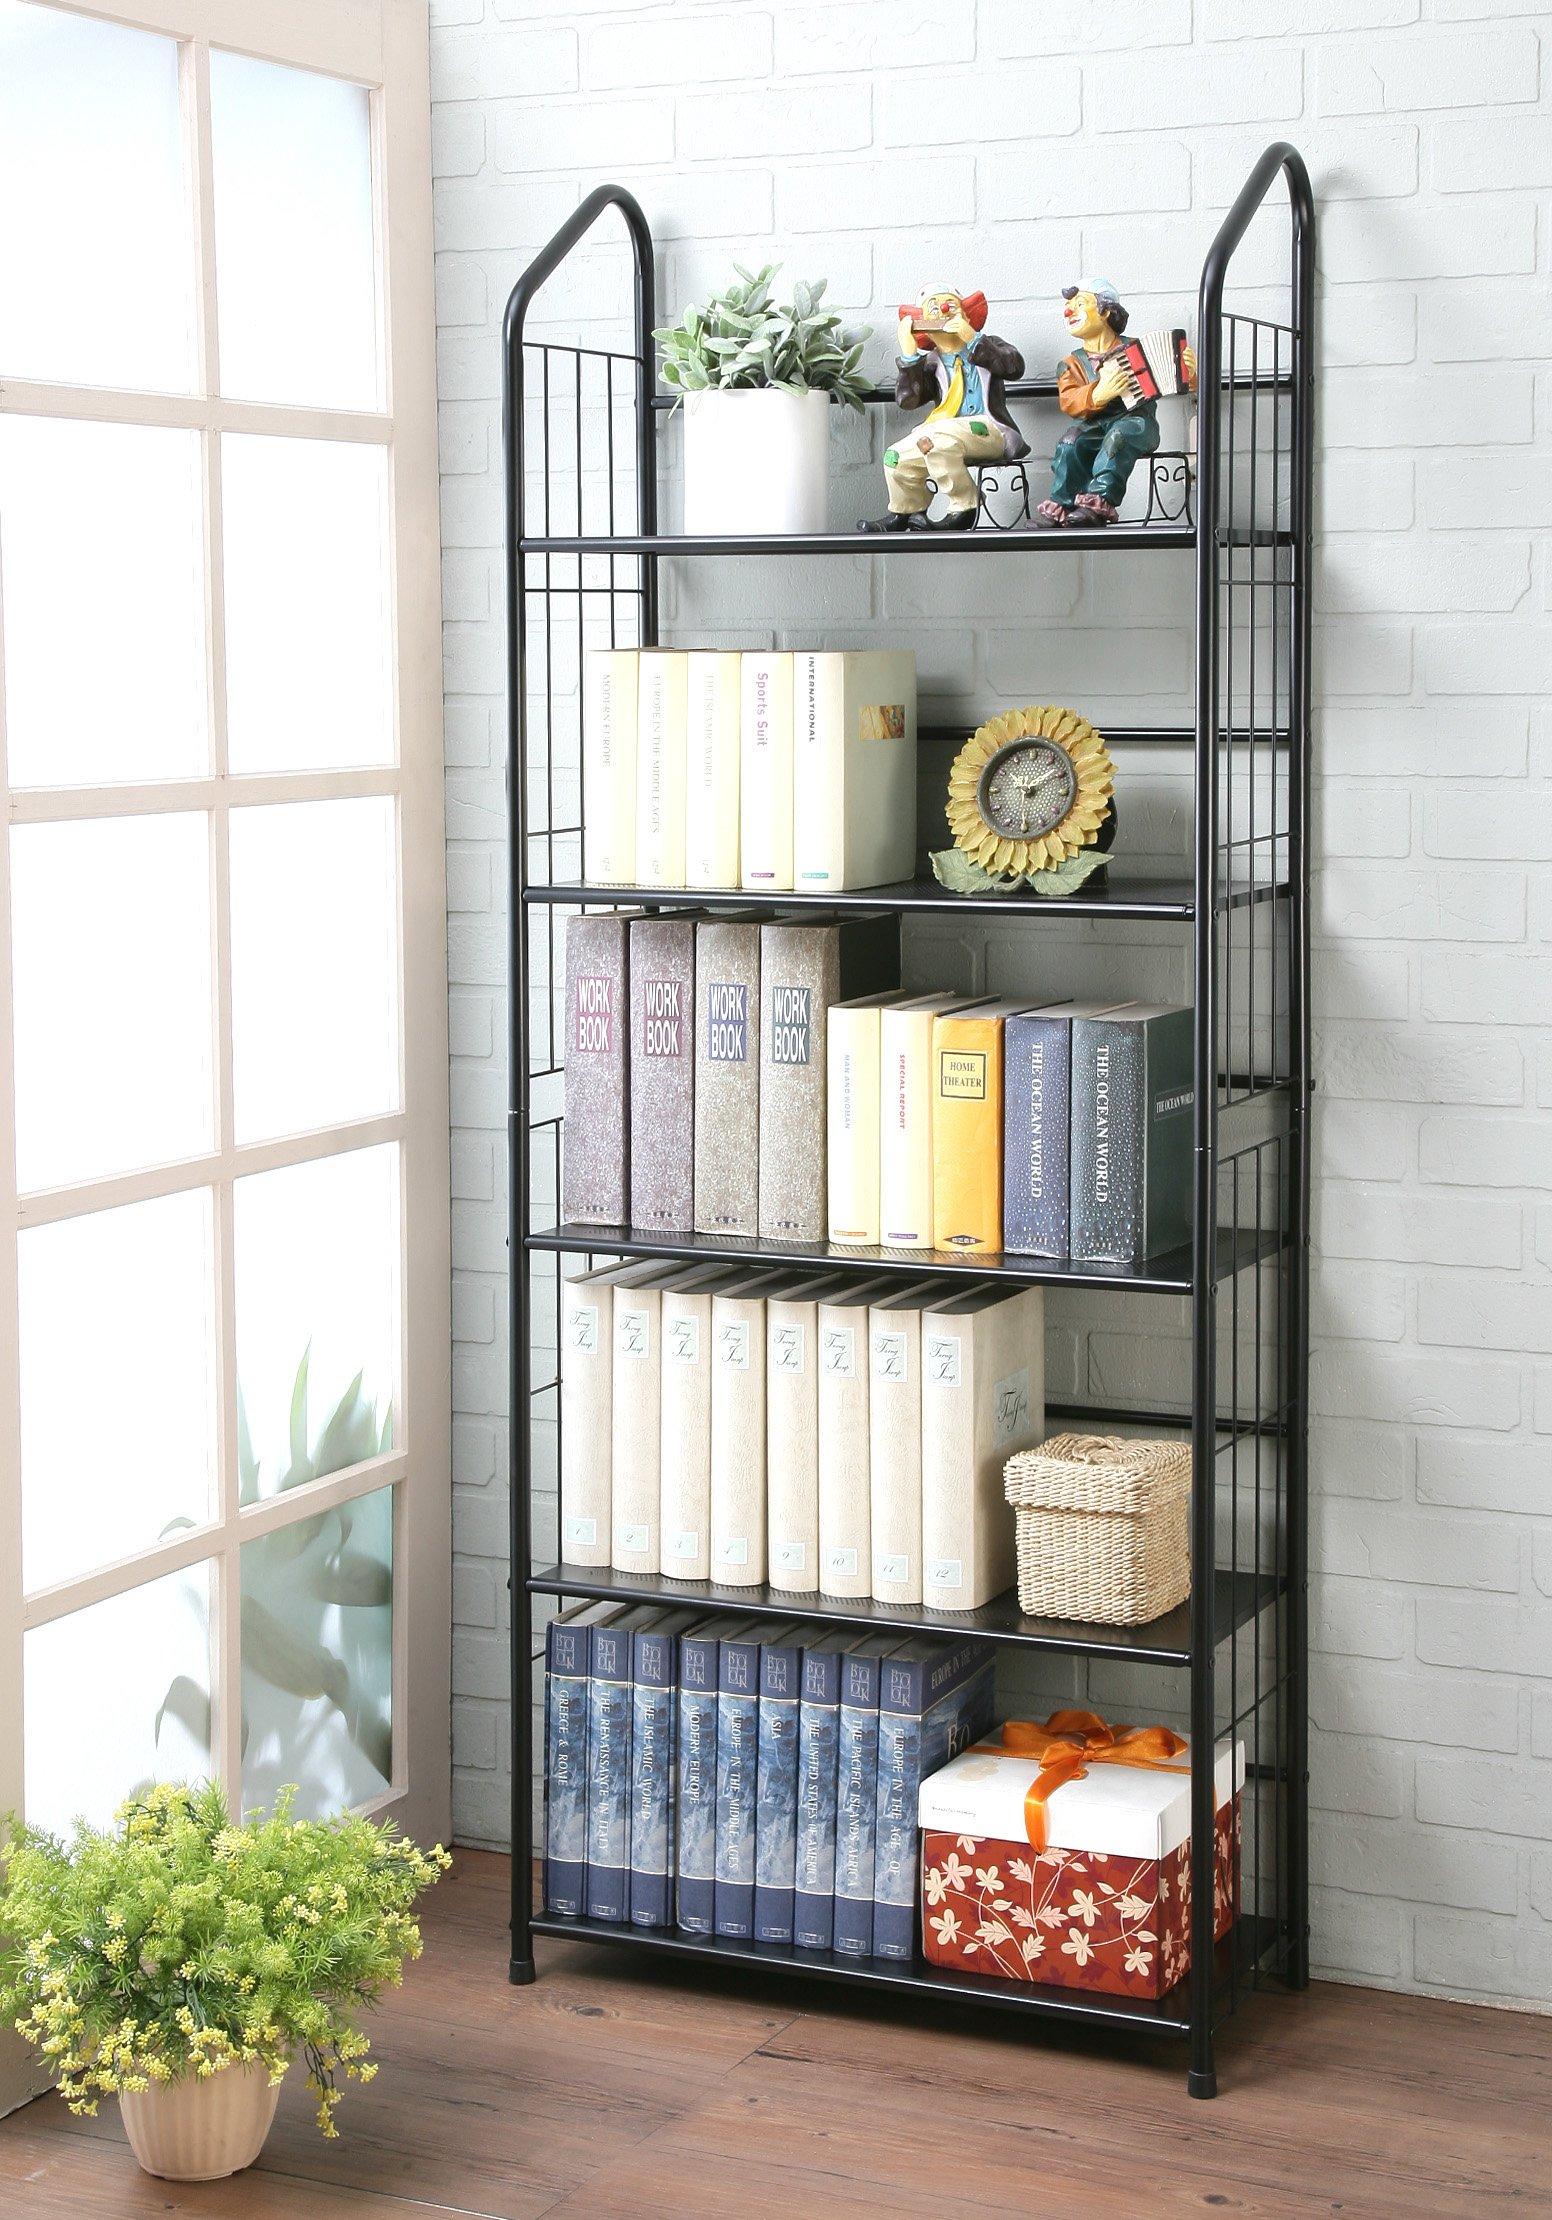 unbrand FT-597BK-5 Black 5 Tier Metal Bookshelf Rack, - Five tier shelving unit Constructed of sturdy metal Painted in Black Finish - living-room-furniture, living-room, bookcases-bookshelves - 916ZJSRNspL -